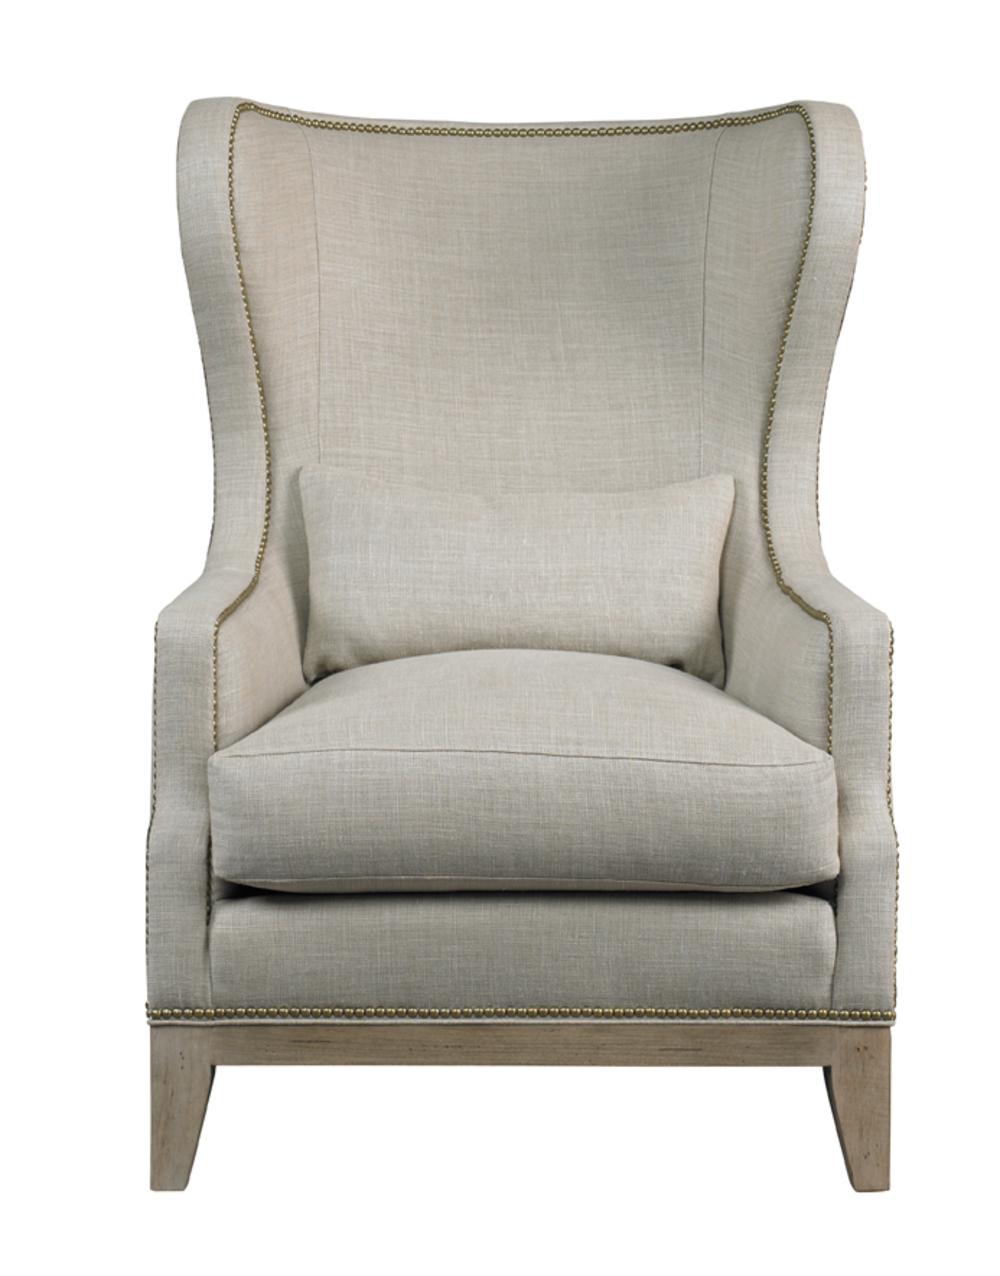 Lillian August Fine Furniture - Ward Chair